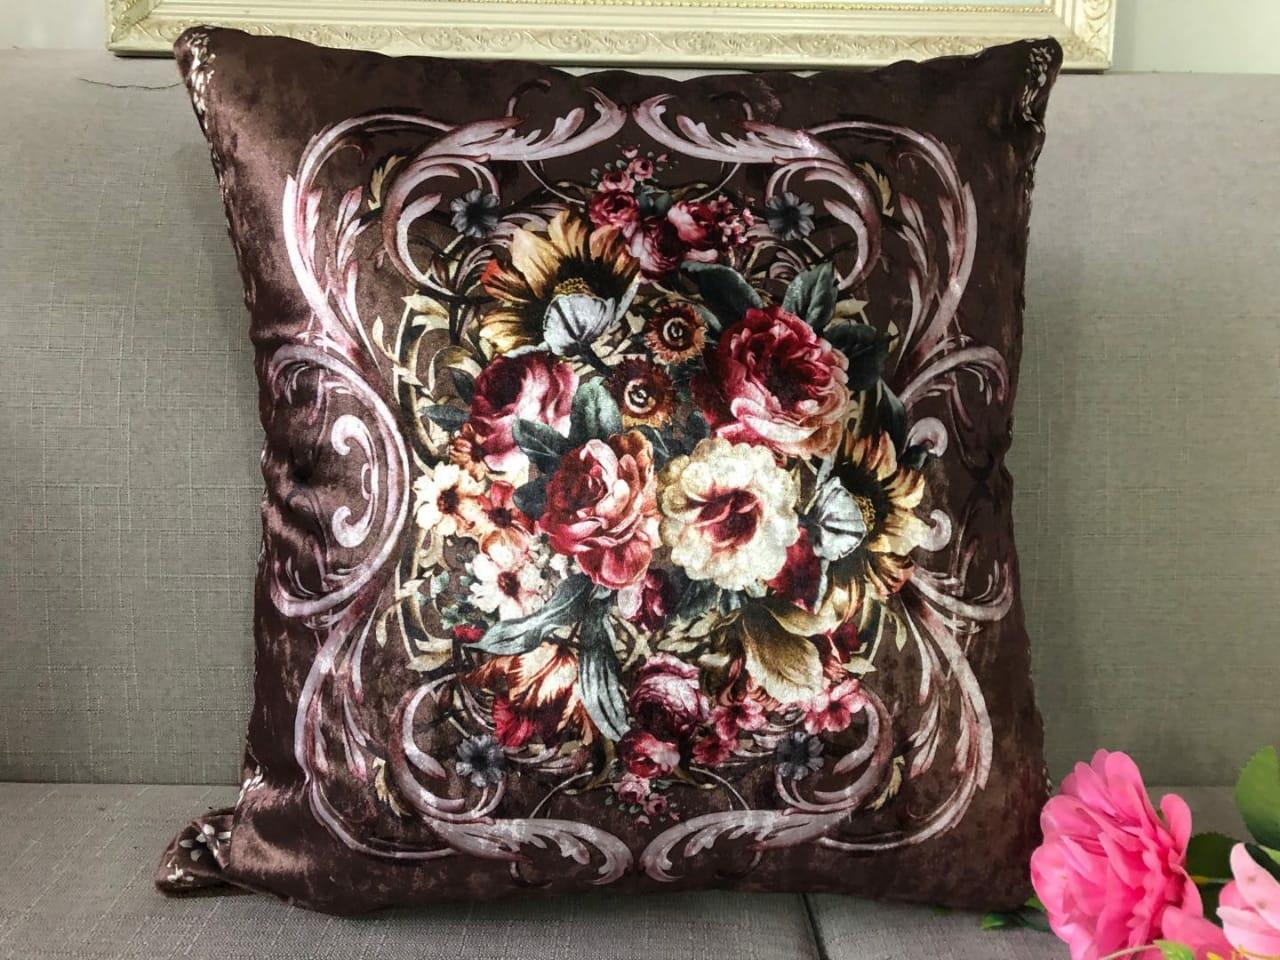 Home Decorative Accent Cushion- 16 x 16 inches 1 Piece Sofa Set